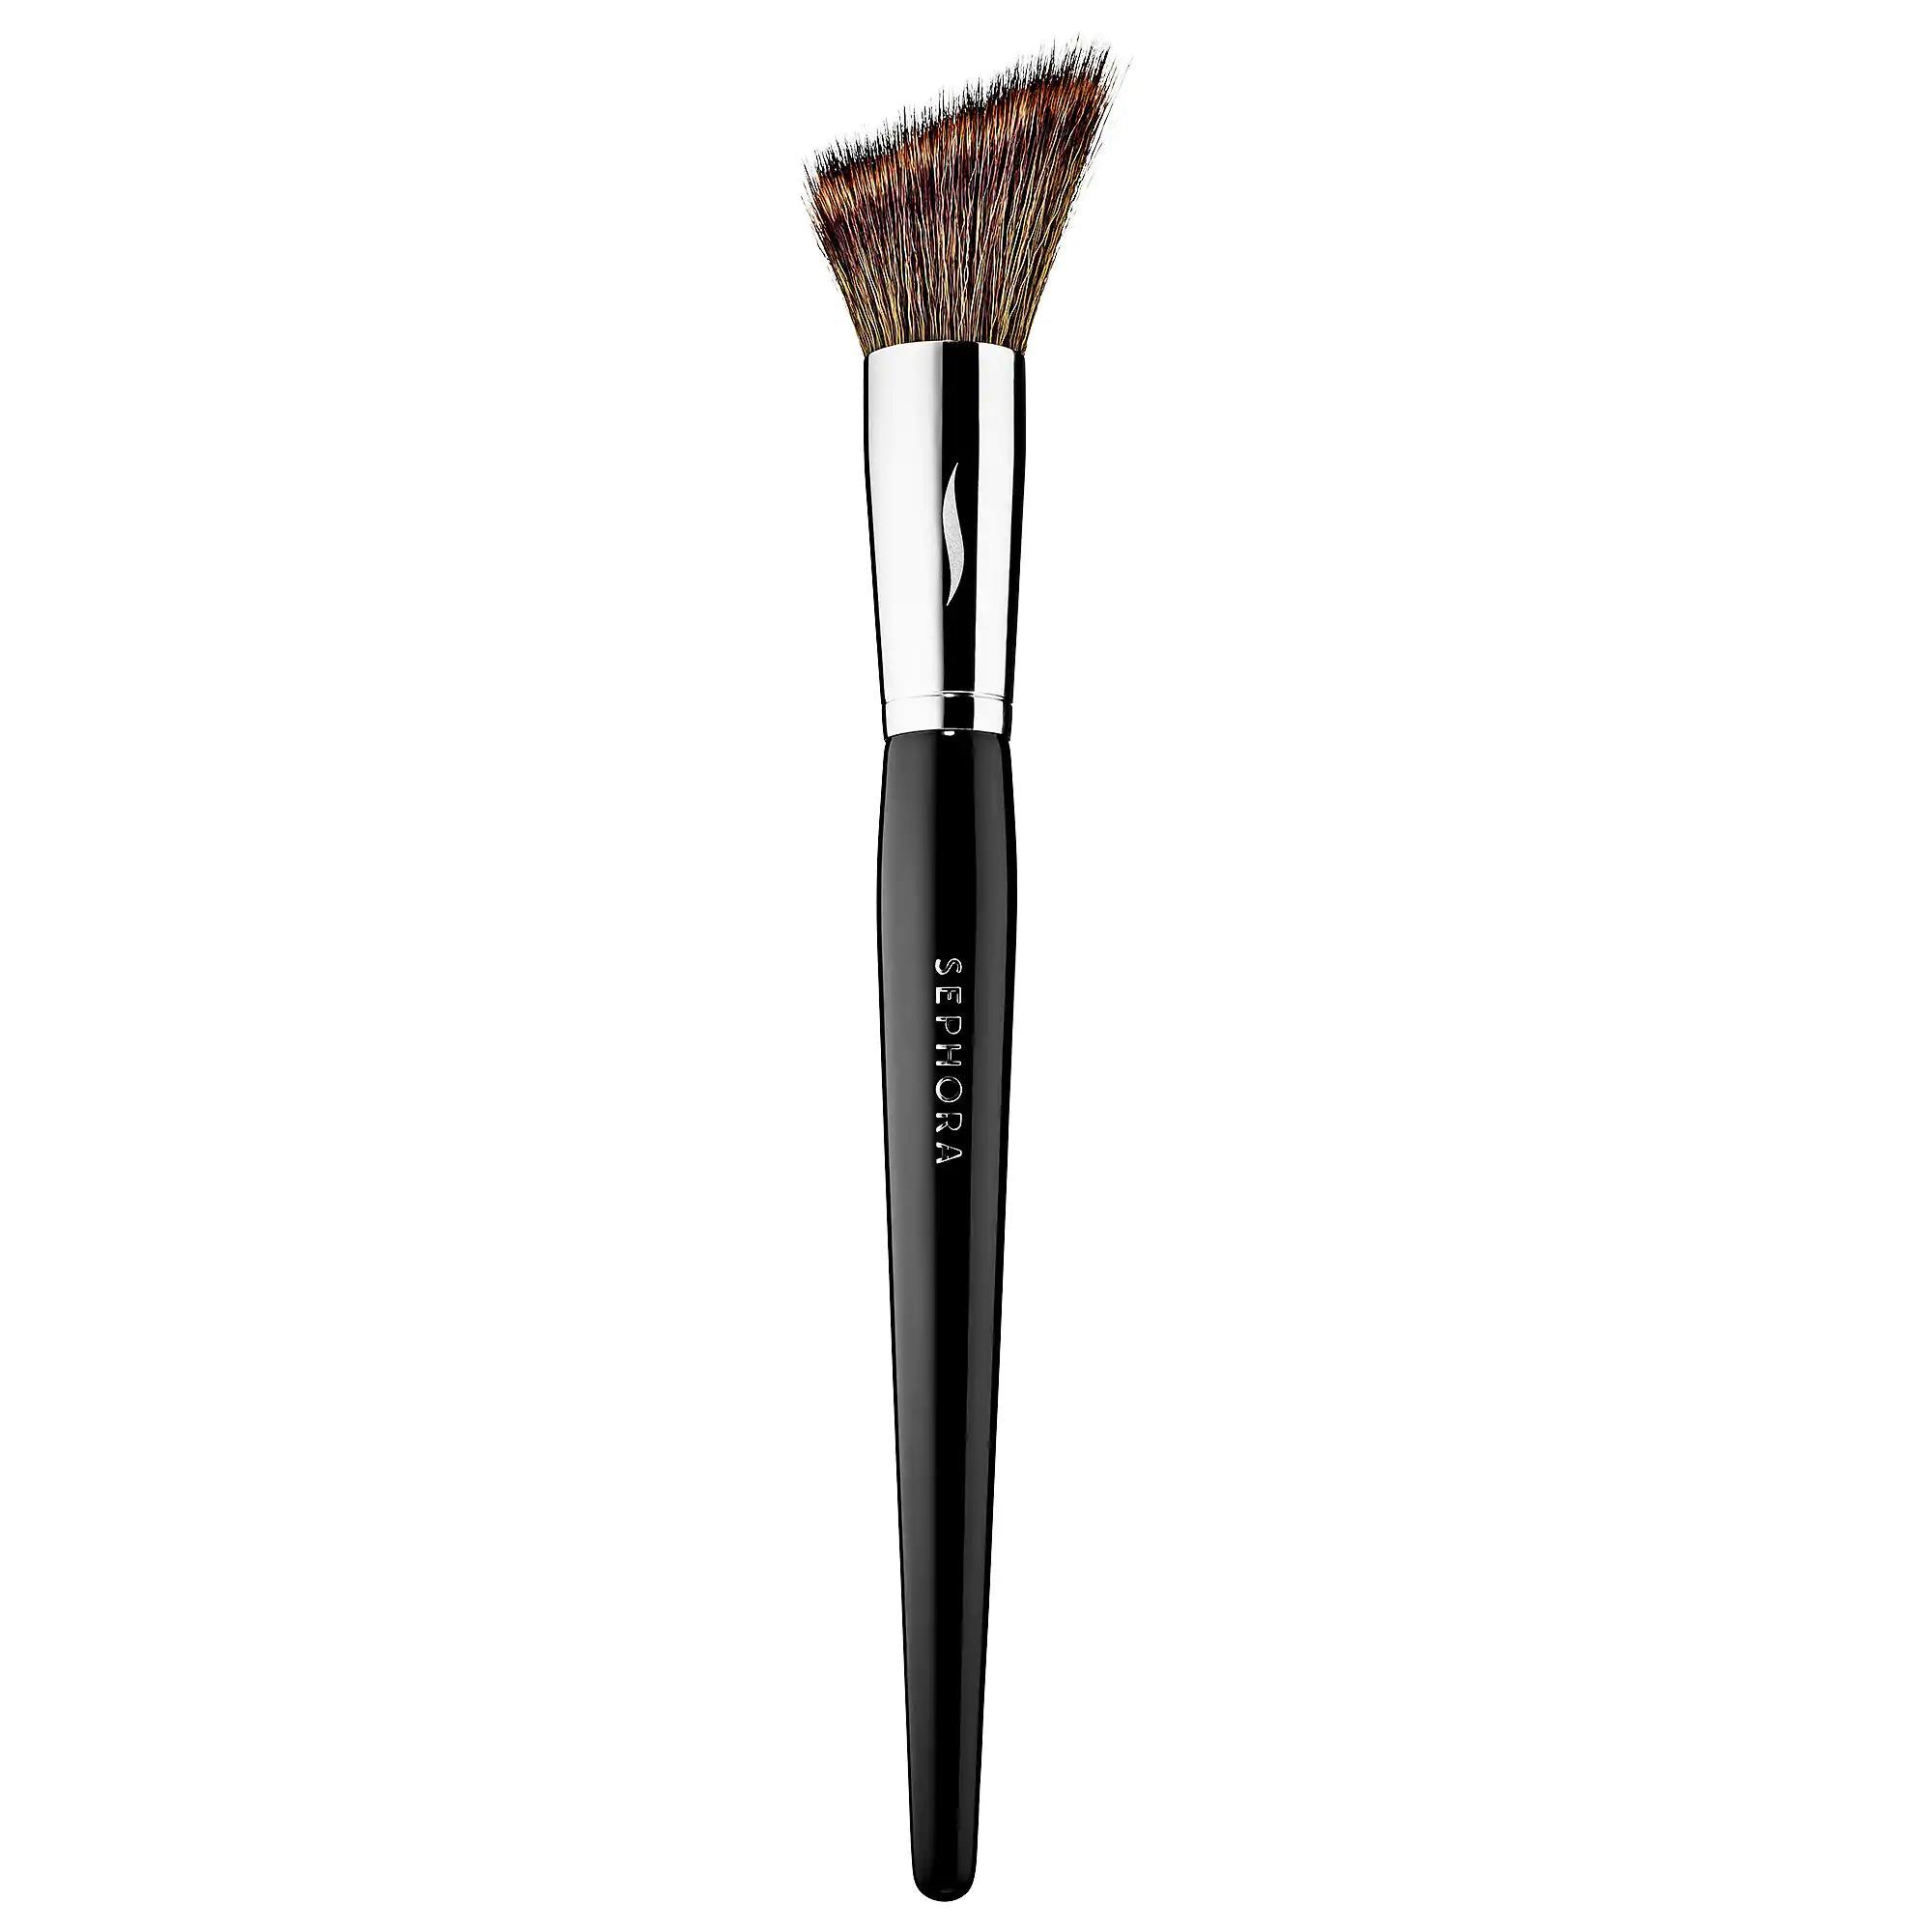 Sephora PRO Angled Diffuser Brush 60